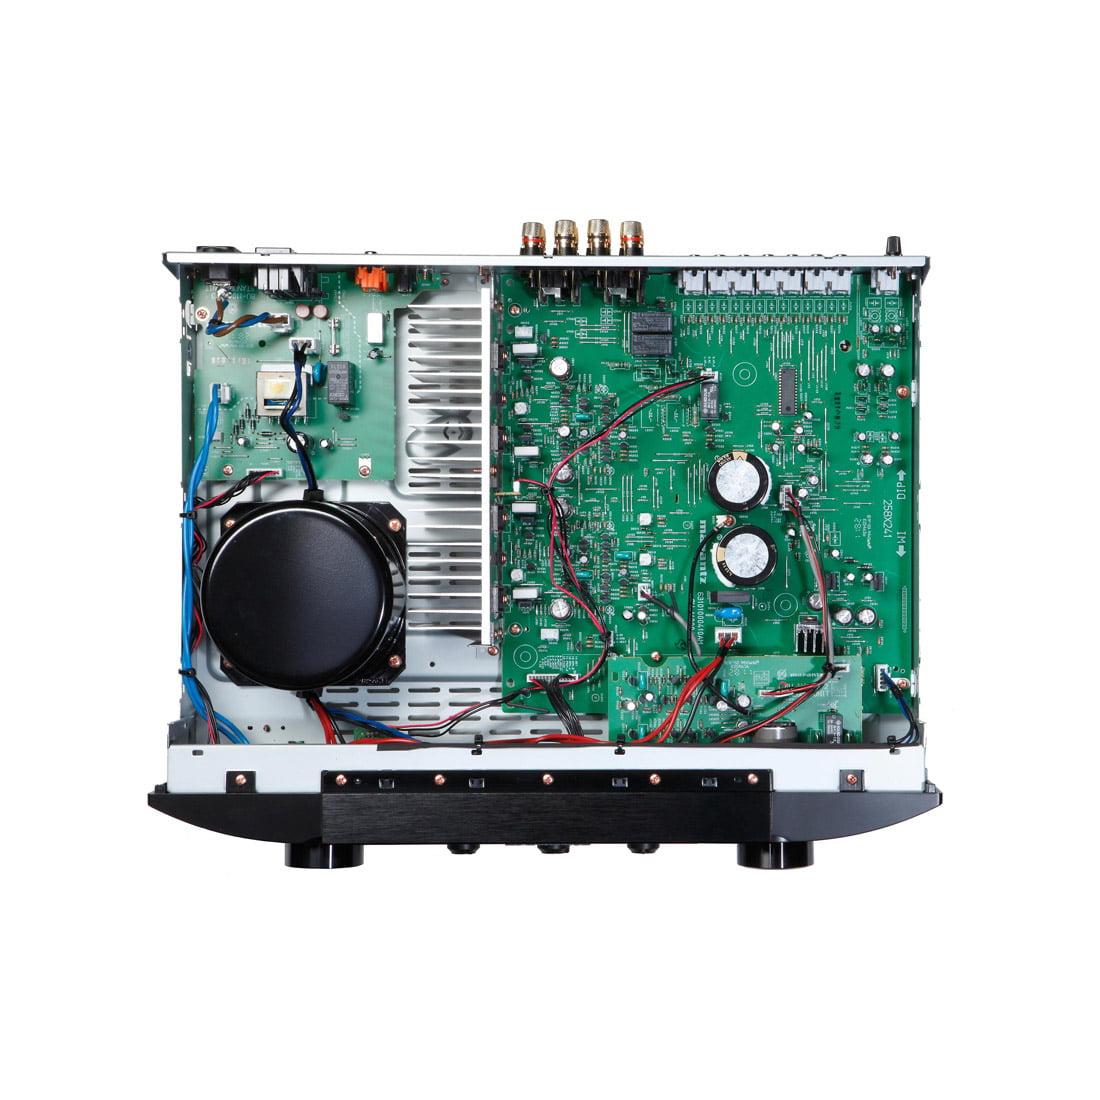 Marantz Pm6004 Stereo Integrated Amplifier B Stock